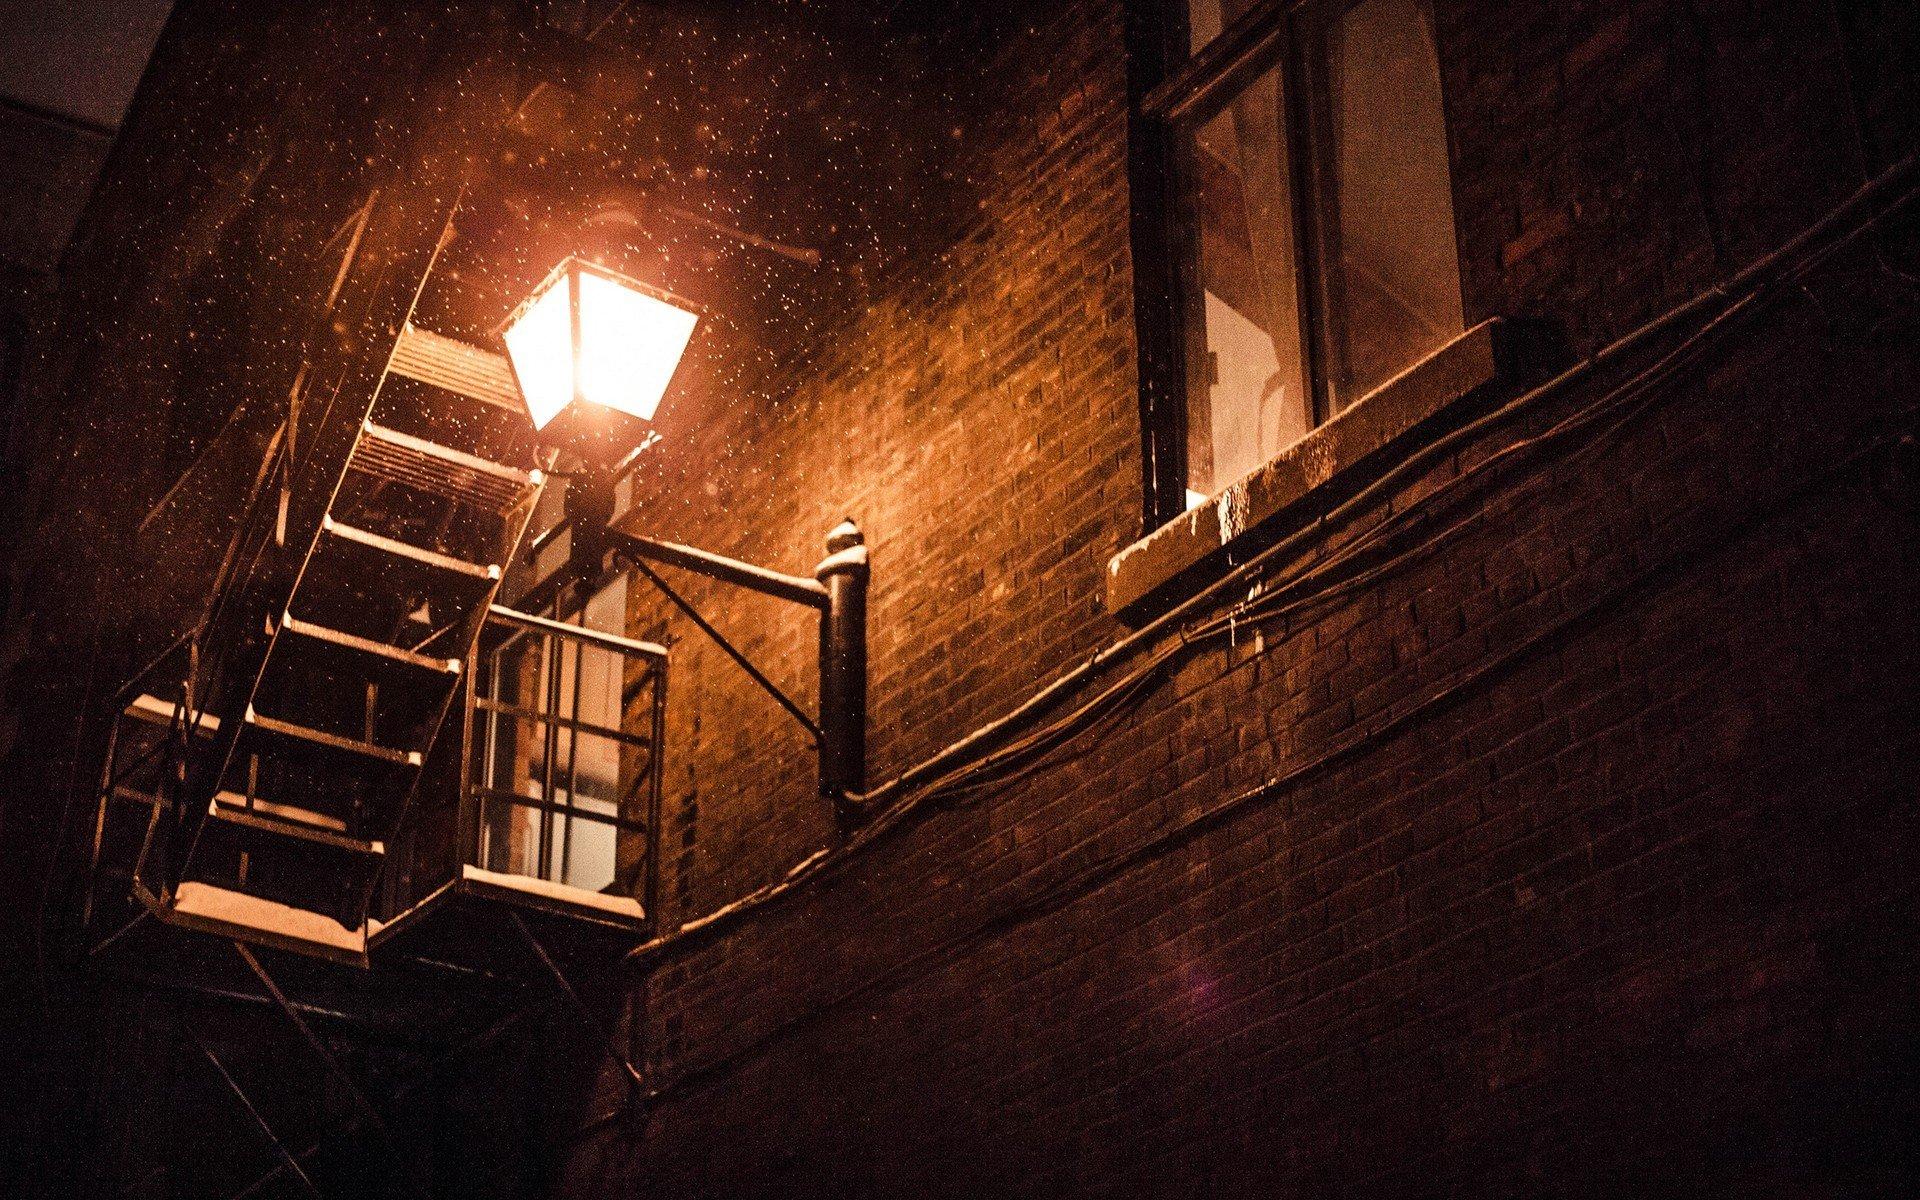 Night, Snow, Lantern, Wall, Building HD Wallpapers